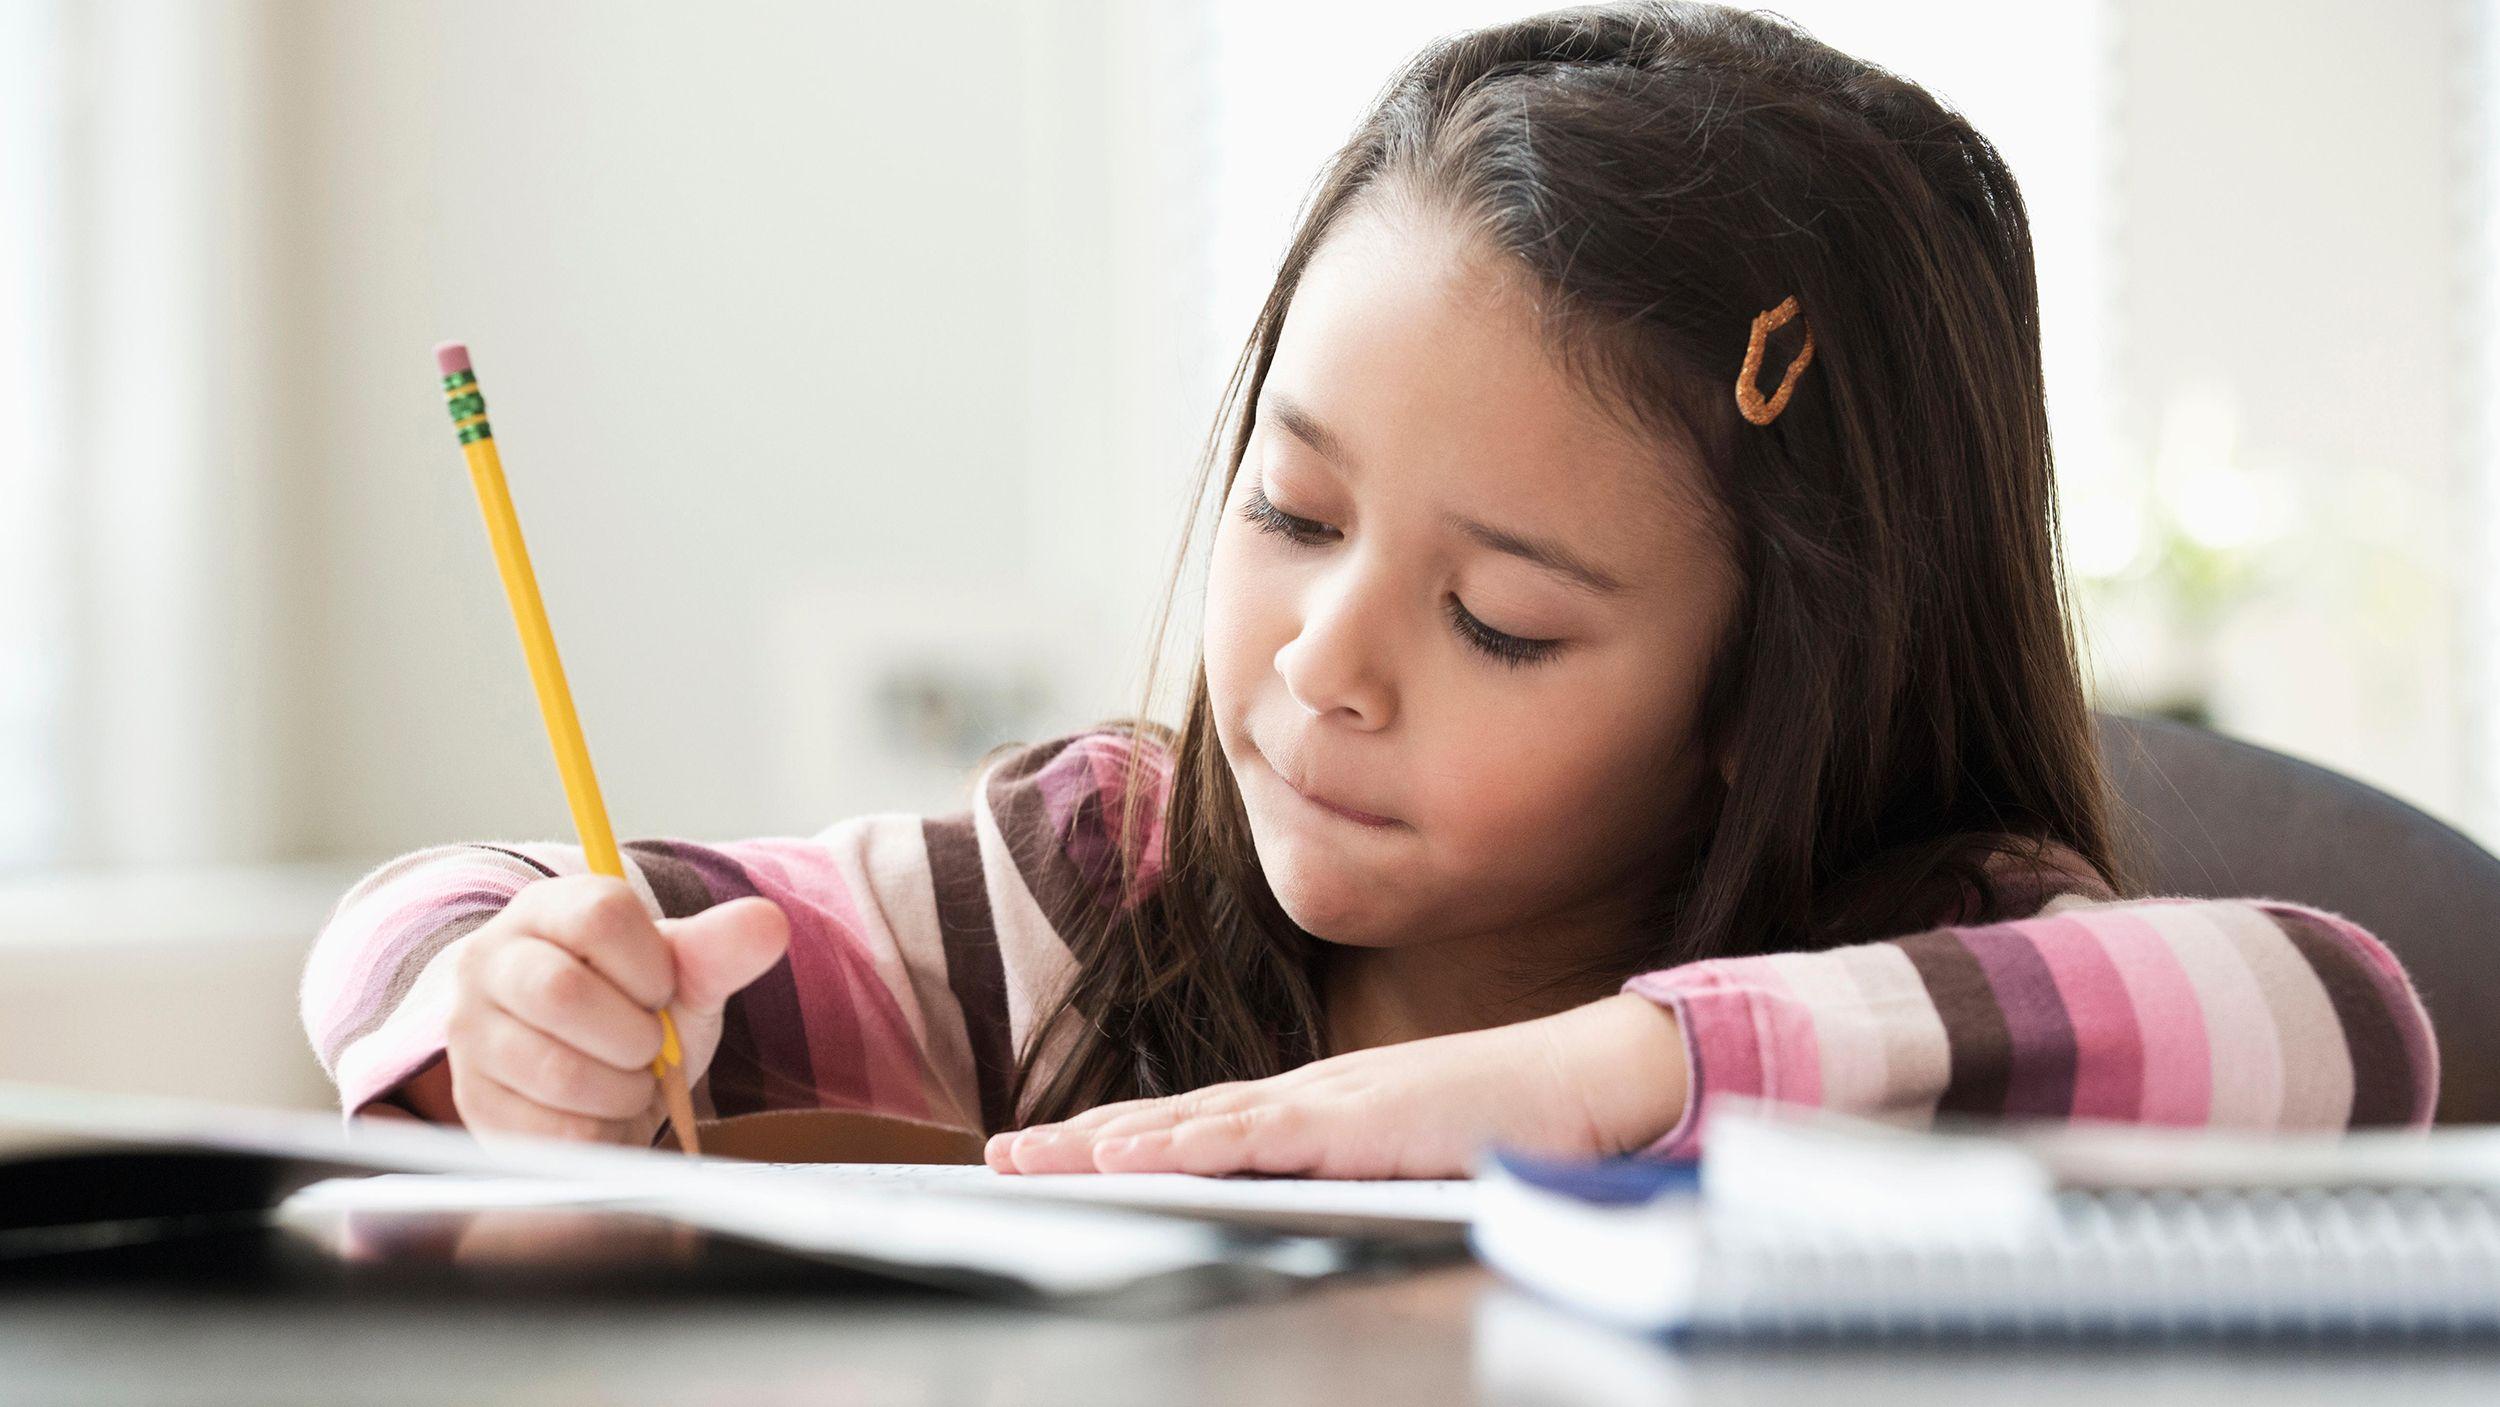 Florida county bans homework for elementary school